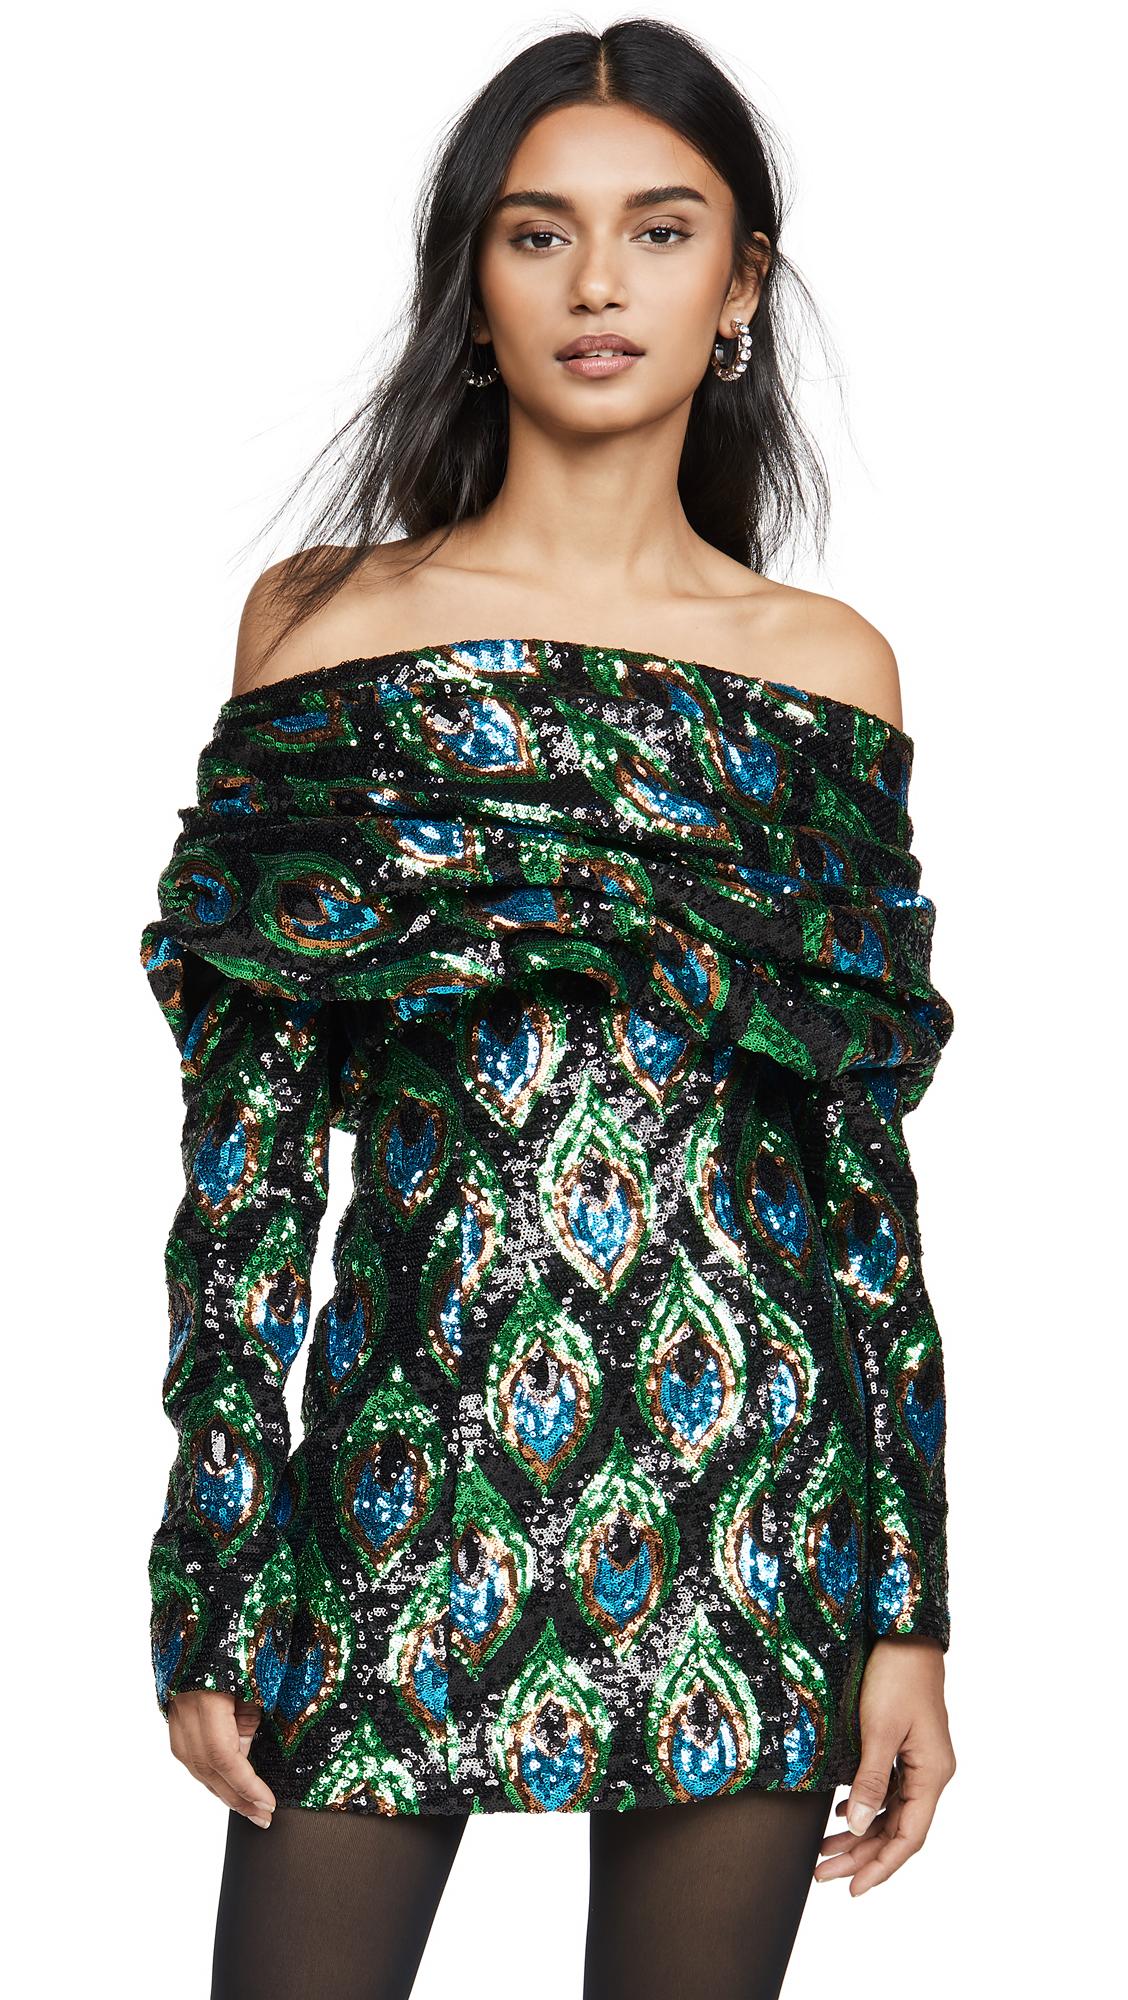 Buy Giuseppe di Morabito Off the Shoulder Sequined Mini Dress online beautiful Giuseppe di Morabito Clothing, Dresses